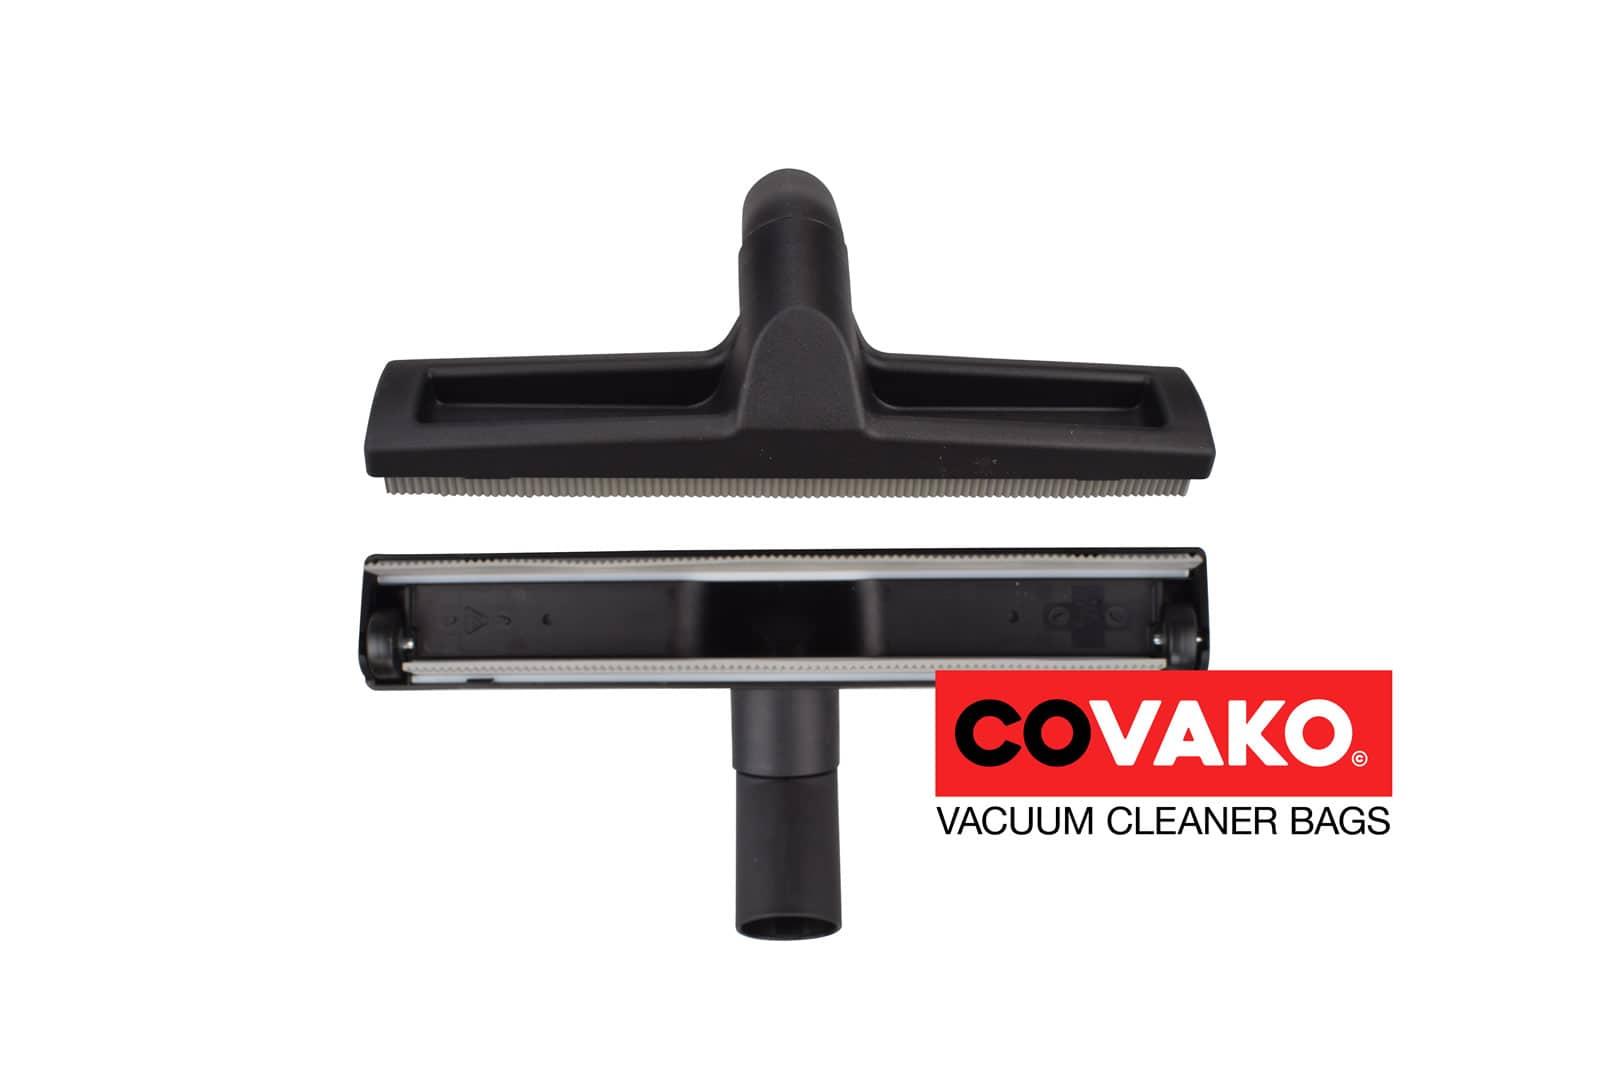 Water nozzle for wet floors / Part Item - Nassbodendüsevacuum cleaner bags